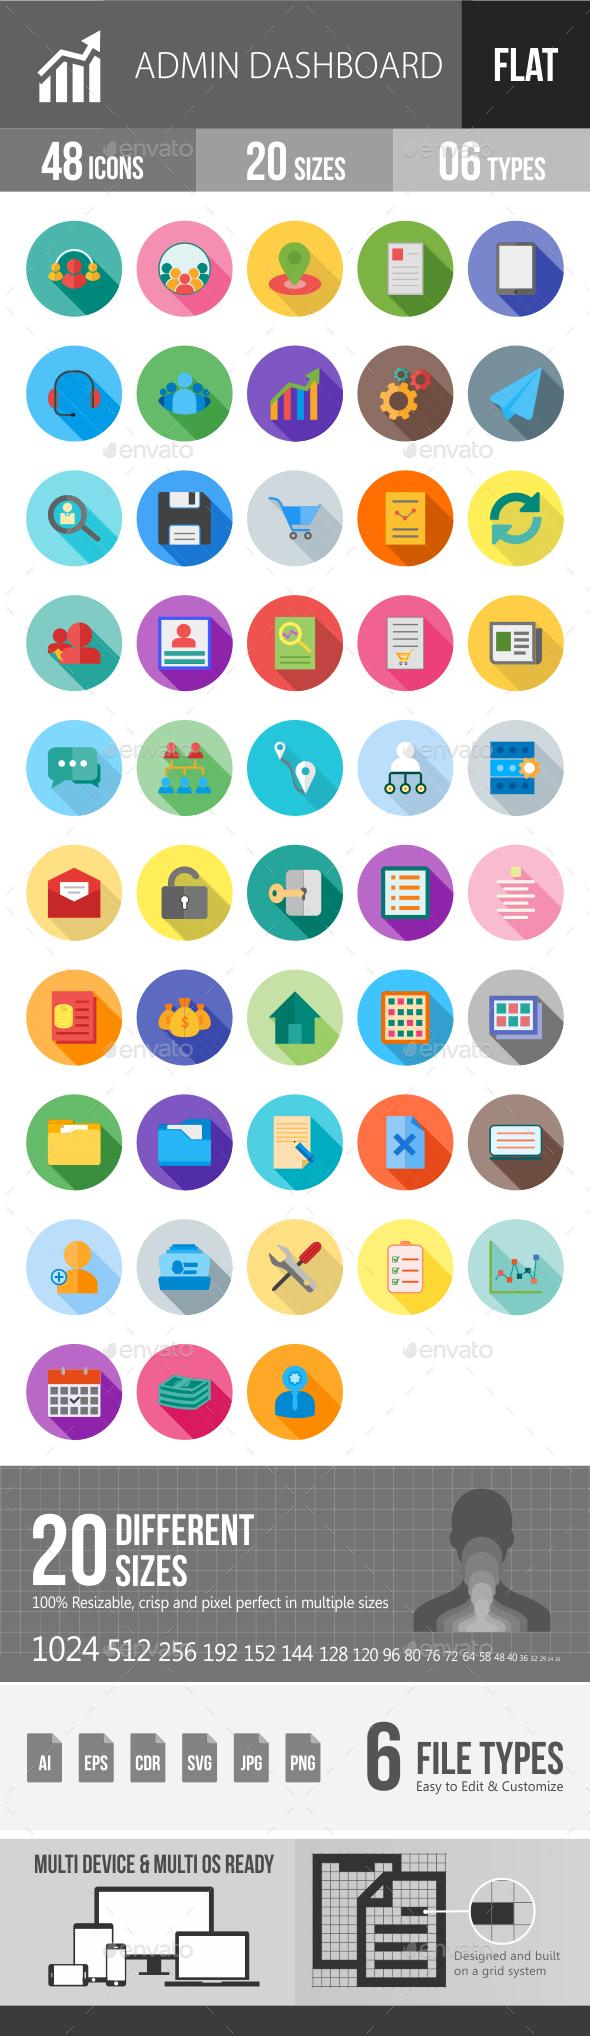 Admin Dashboard Flat Shadowed Icons - Icons